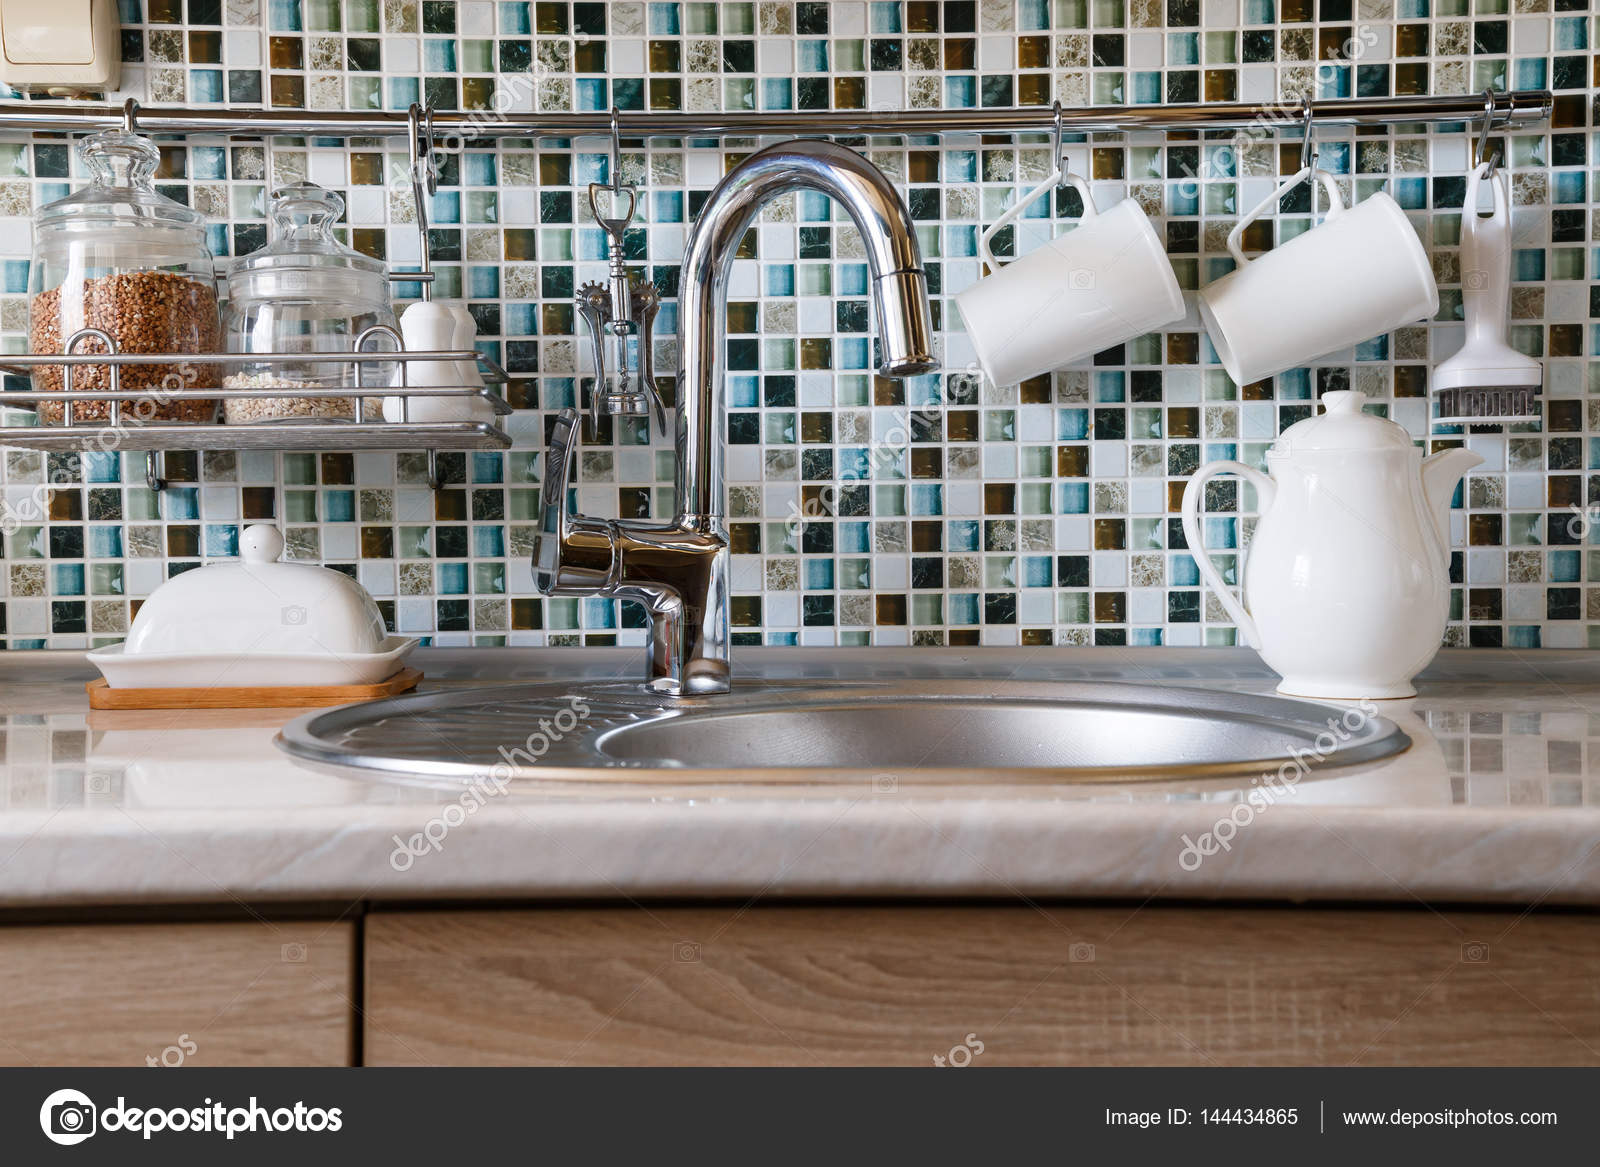 built in kitchen table garbage cans 厨房内饰和厨房用具 厨房的桌子 各种白色盘子和内置的厨房的水槽与金属 各种白色盘子和内置的厨房的水槽与金属漆水龙头 照片作者vladeephoto gmail com